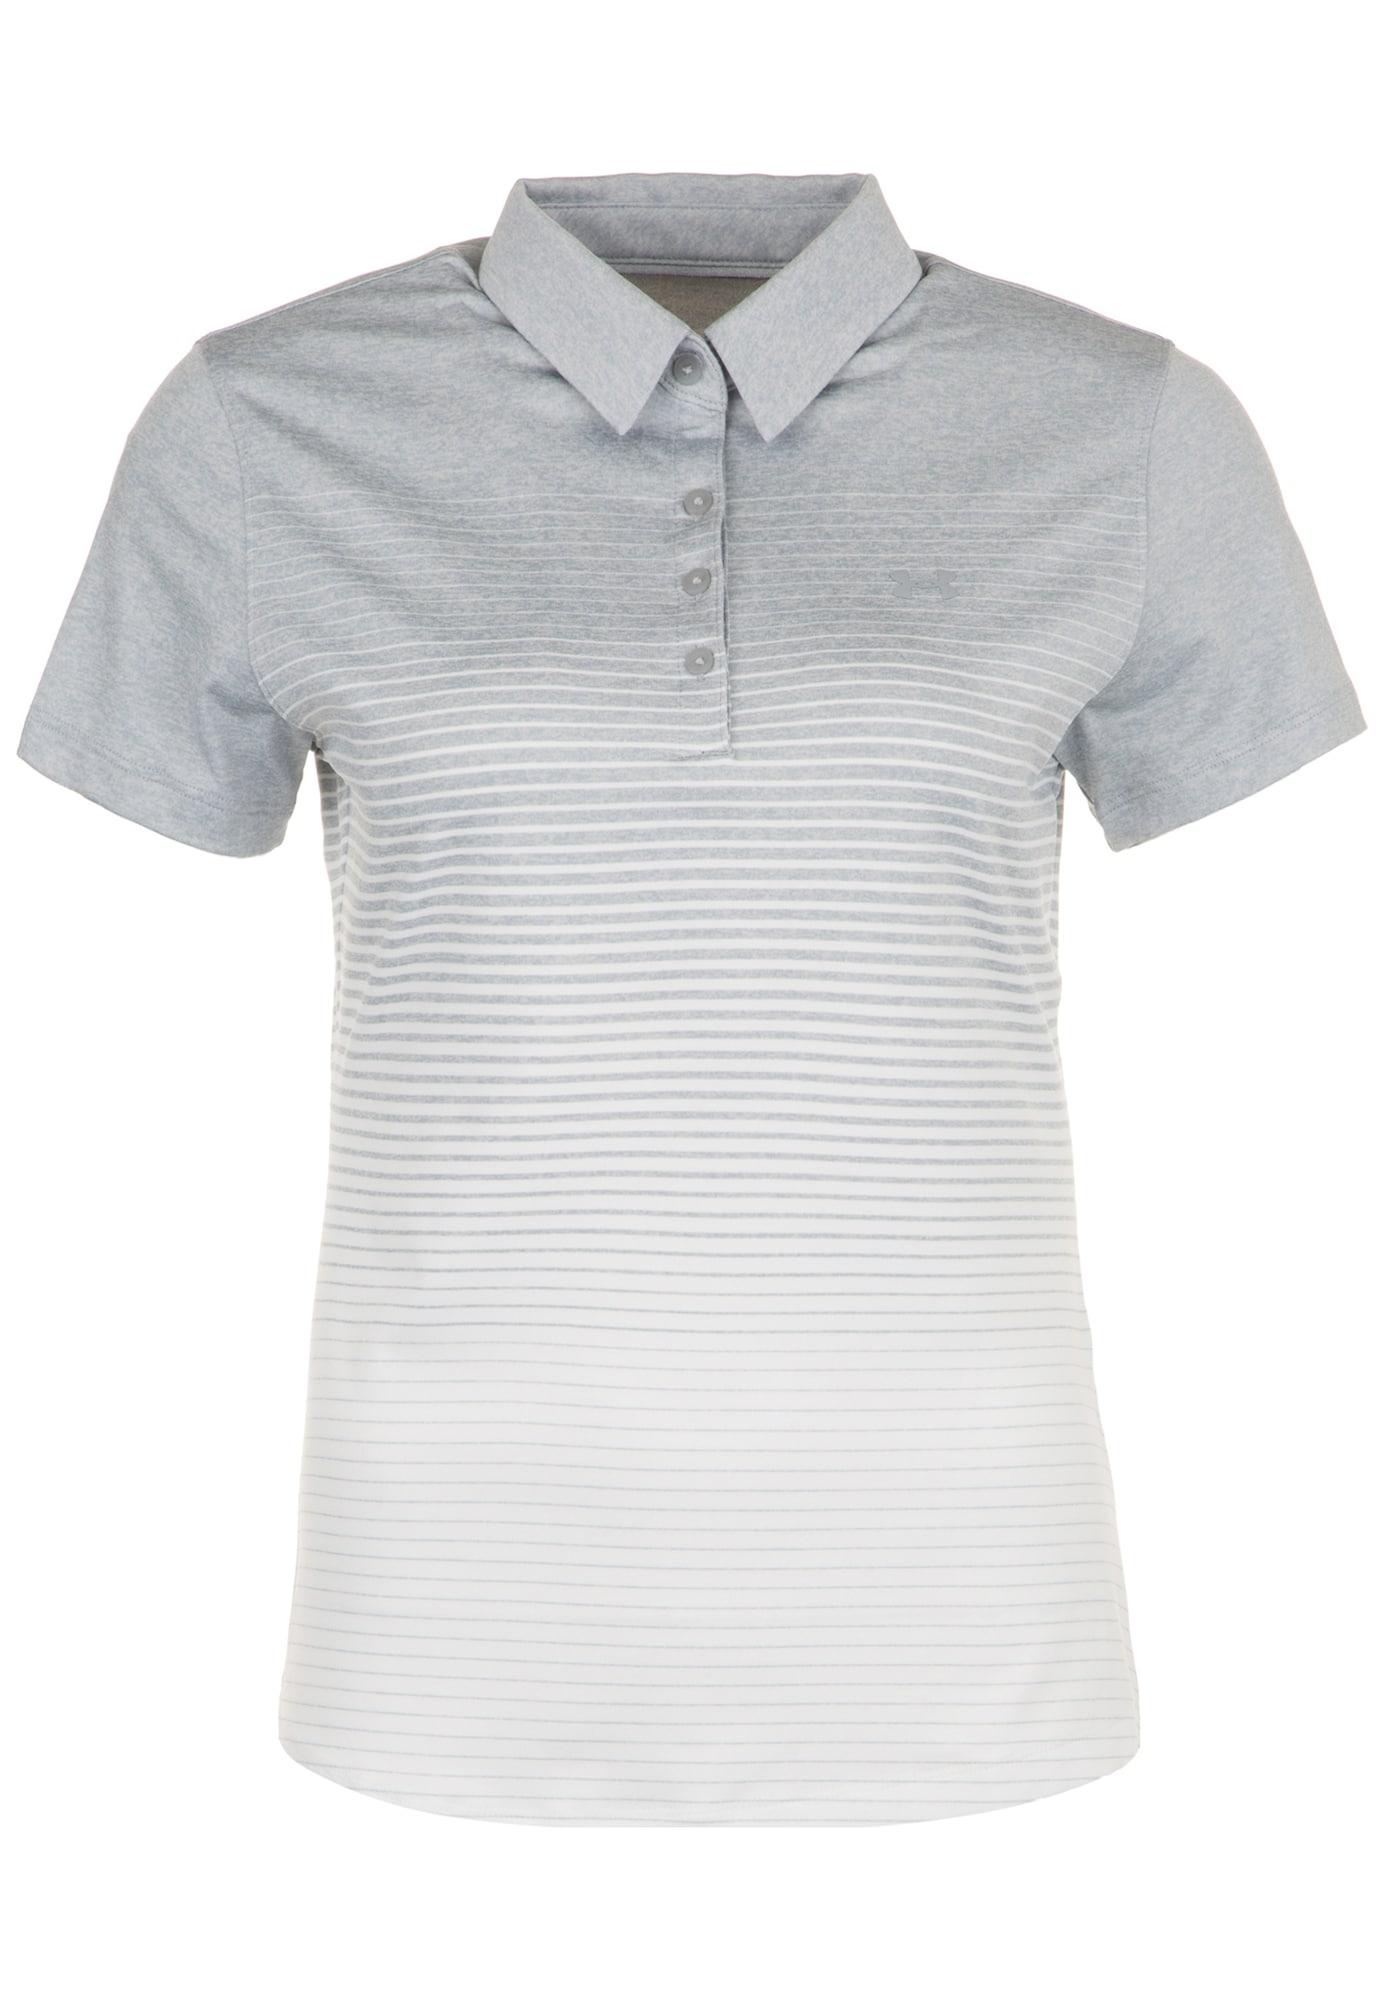 Poloshirt 'Zinger Novelty' | Bekleidung > Shirts > Poloshirts | Grau - Hellgrau | Under Armour